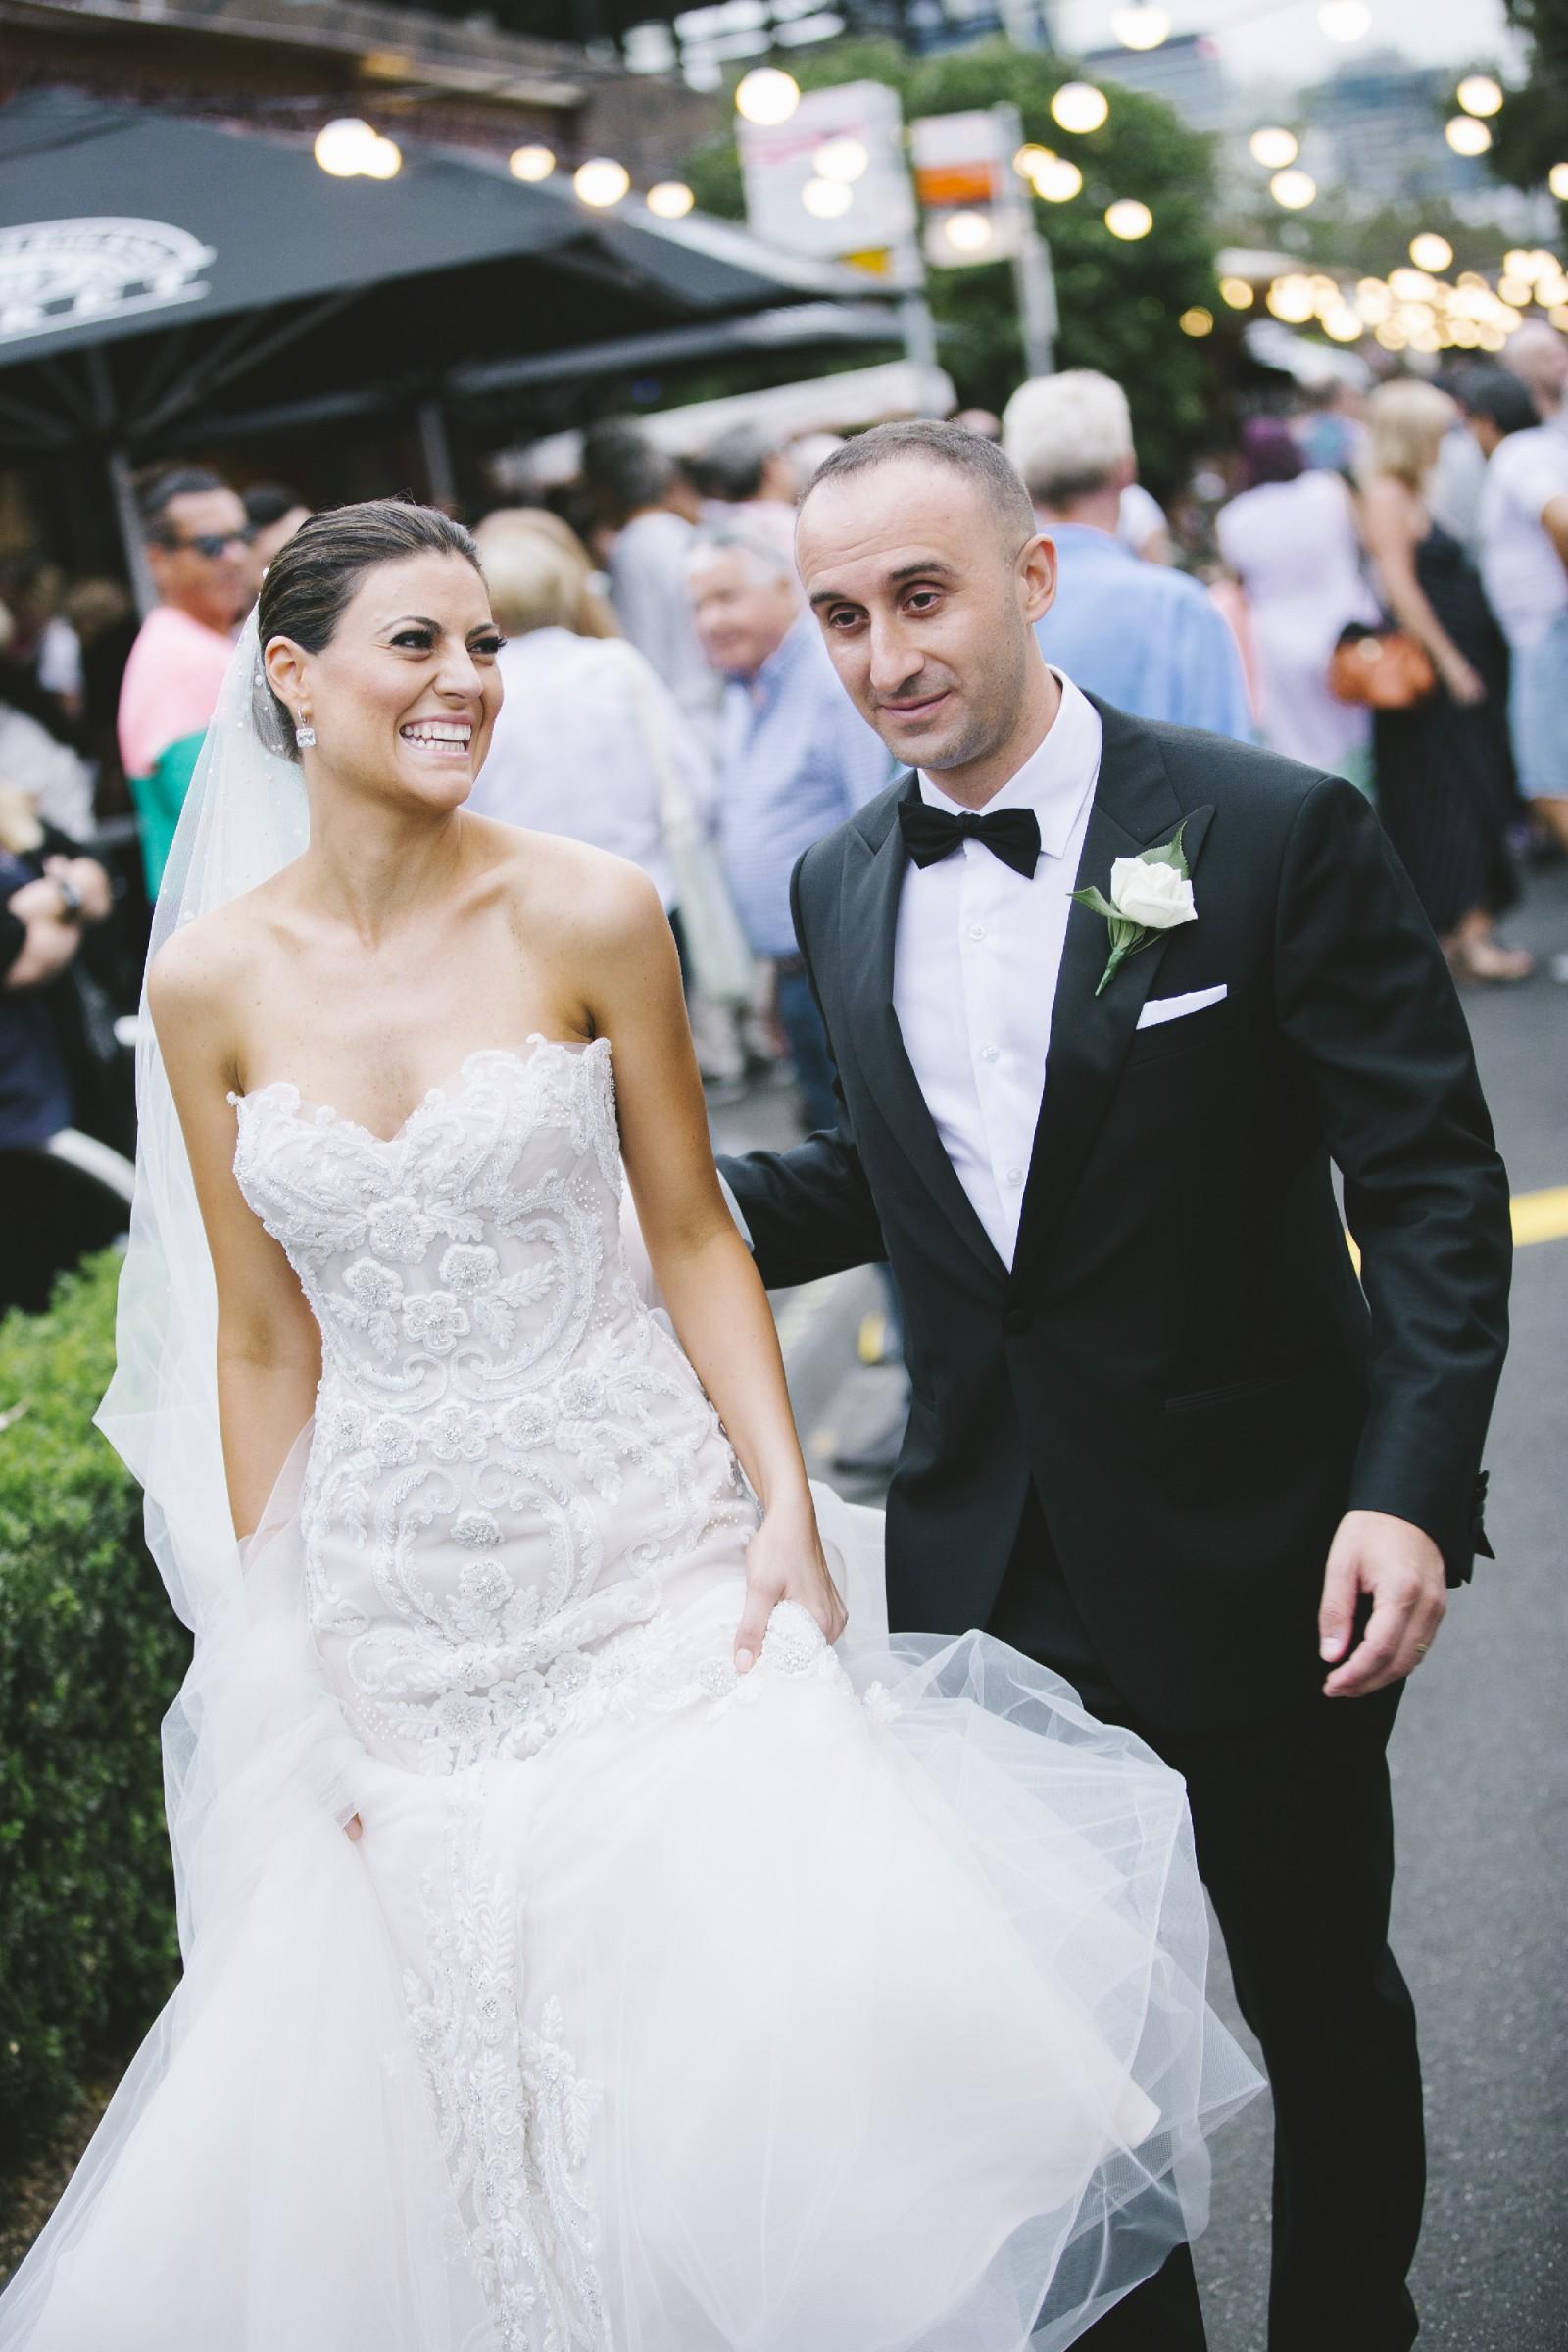 Steven Khalil Custom Made Preowned Wedding Dress On Sale Stillwhite United Kingdom,Wedding Dresse